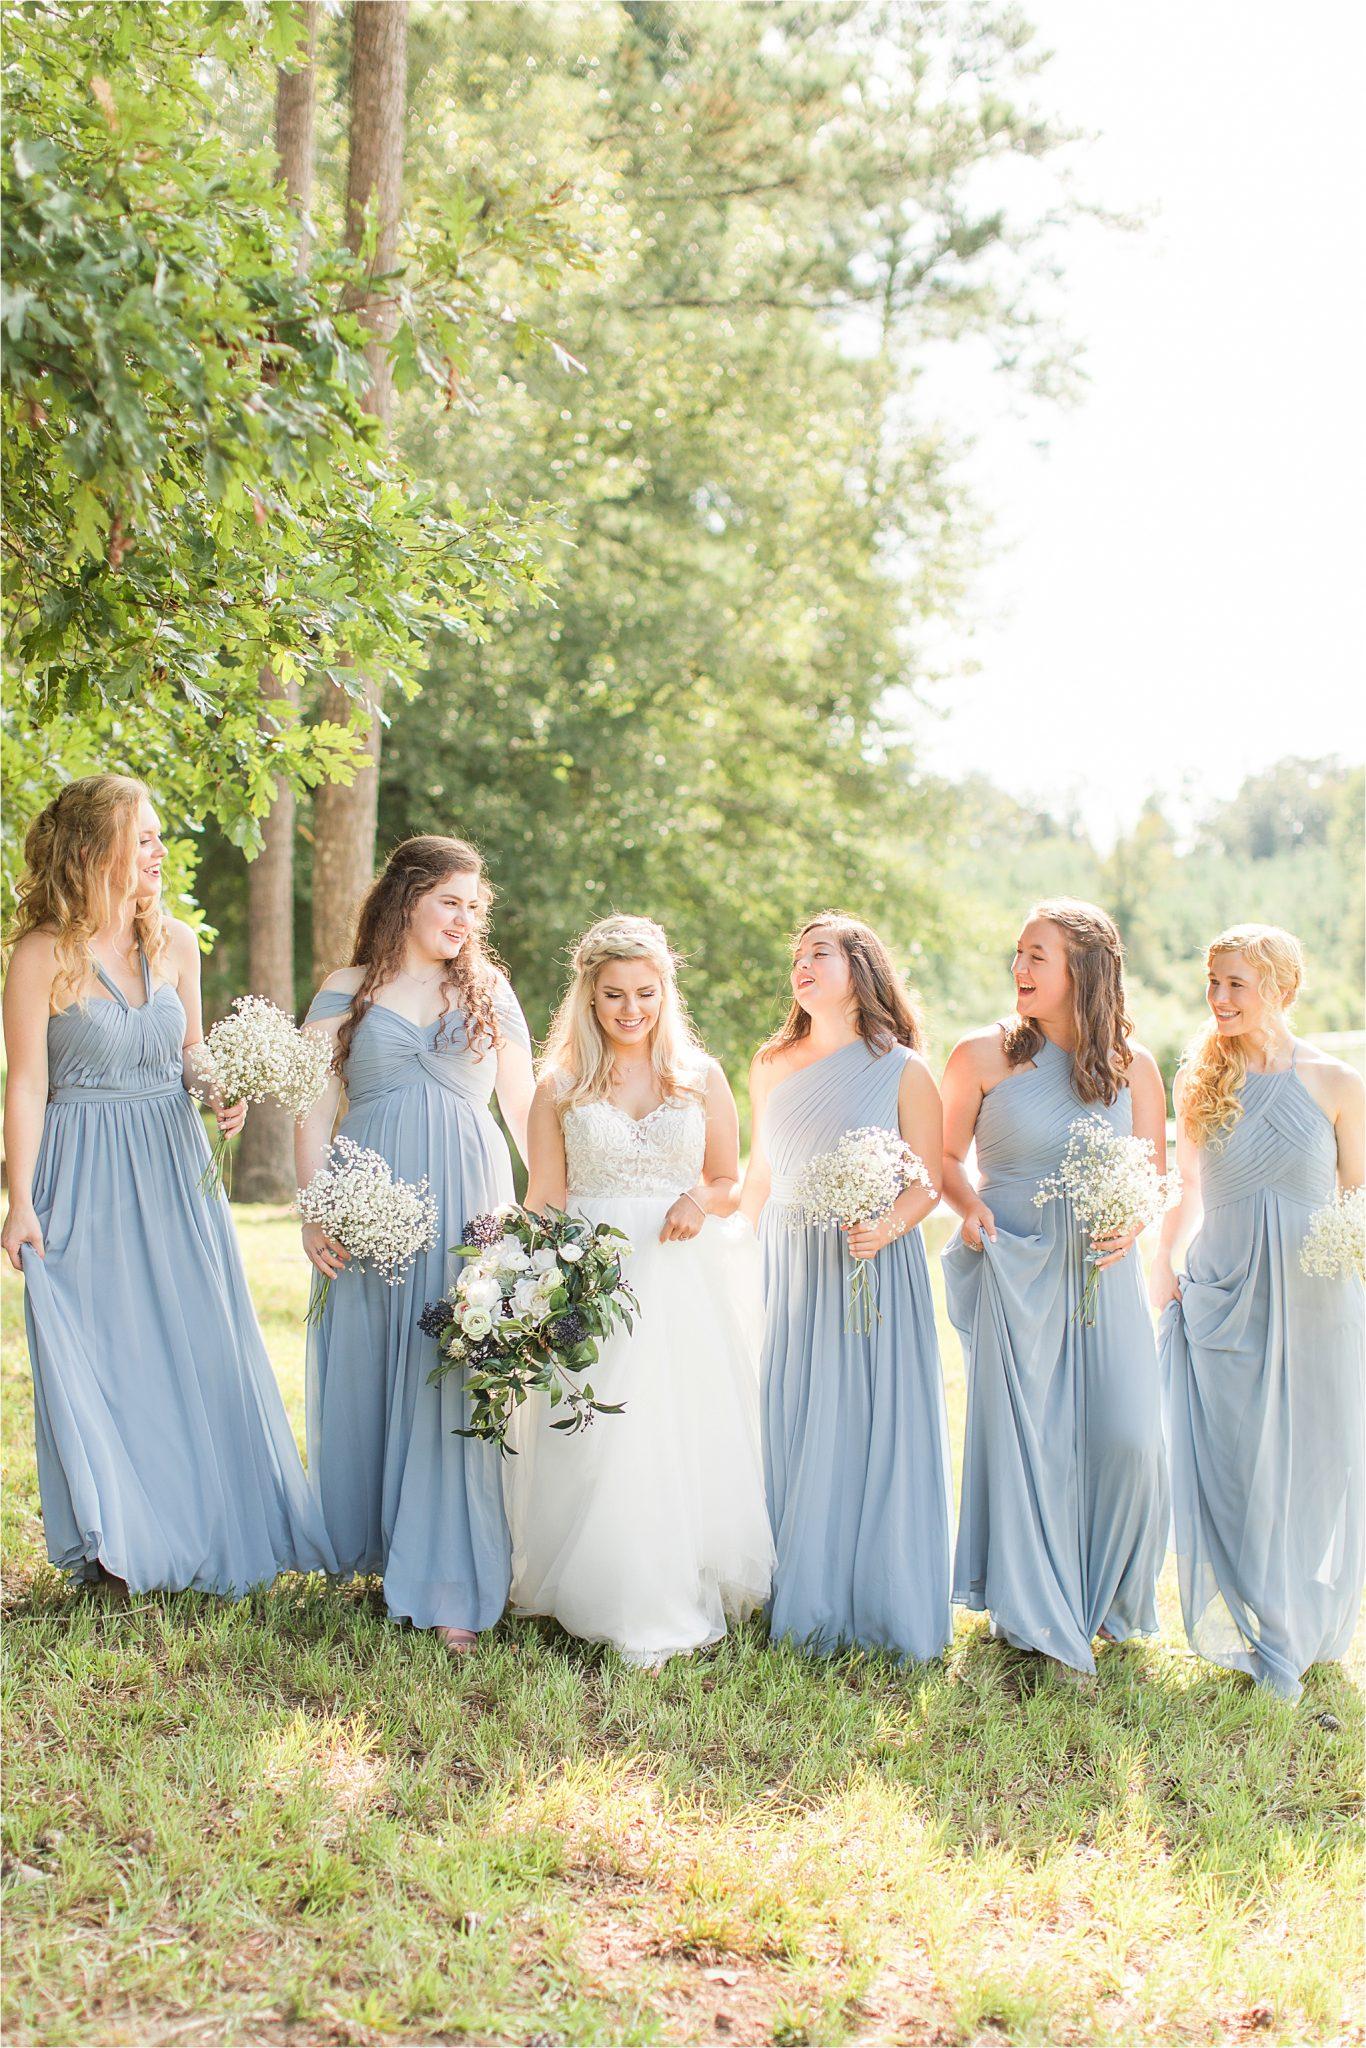 bride-bridesmaids-bouquets-periwinkle-long-dresses-different-cuts-styles